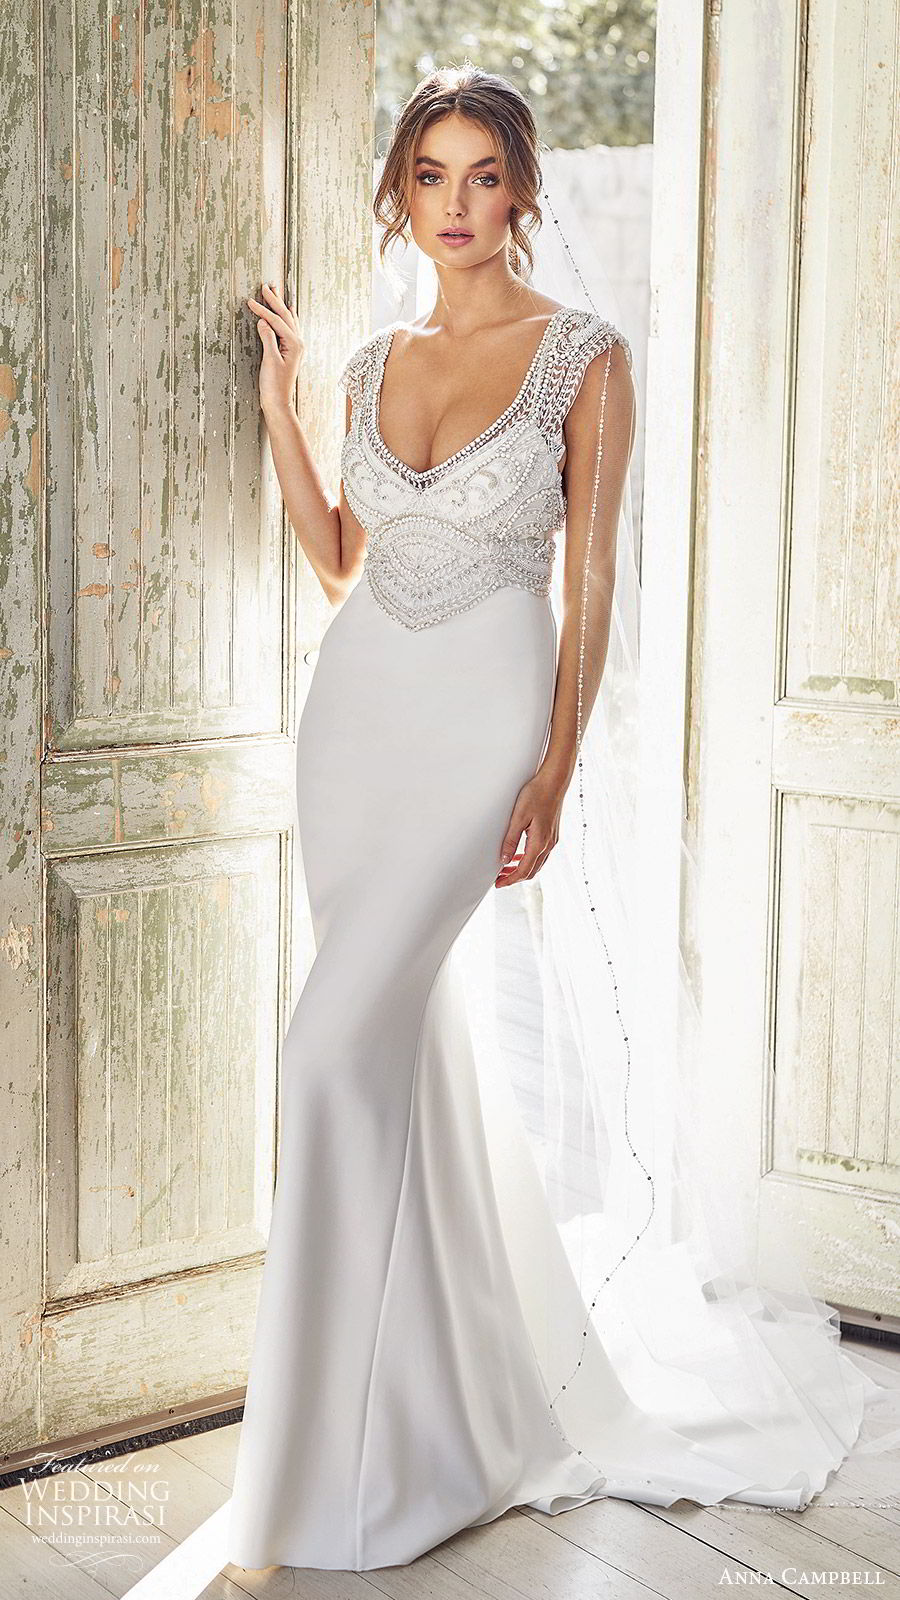 anna campbell 2020 bridal cap sleeves  deep v neckline heavily embellished bodice clean skirt sheath wedding dress (12) elegant glam square back chapel train mv